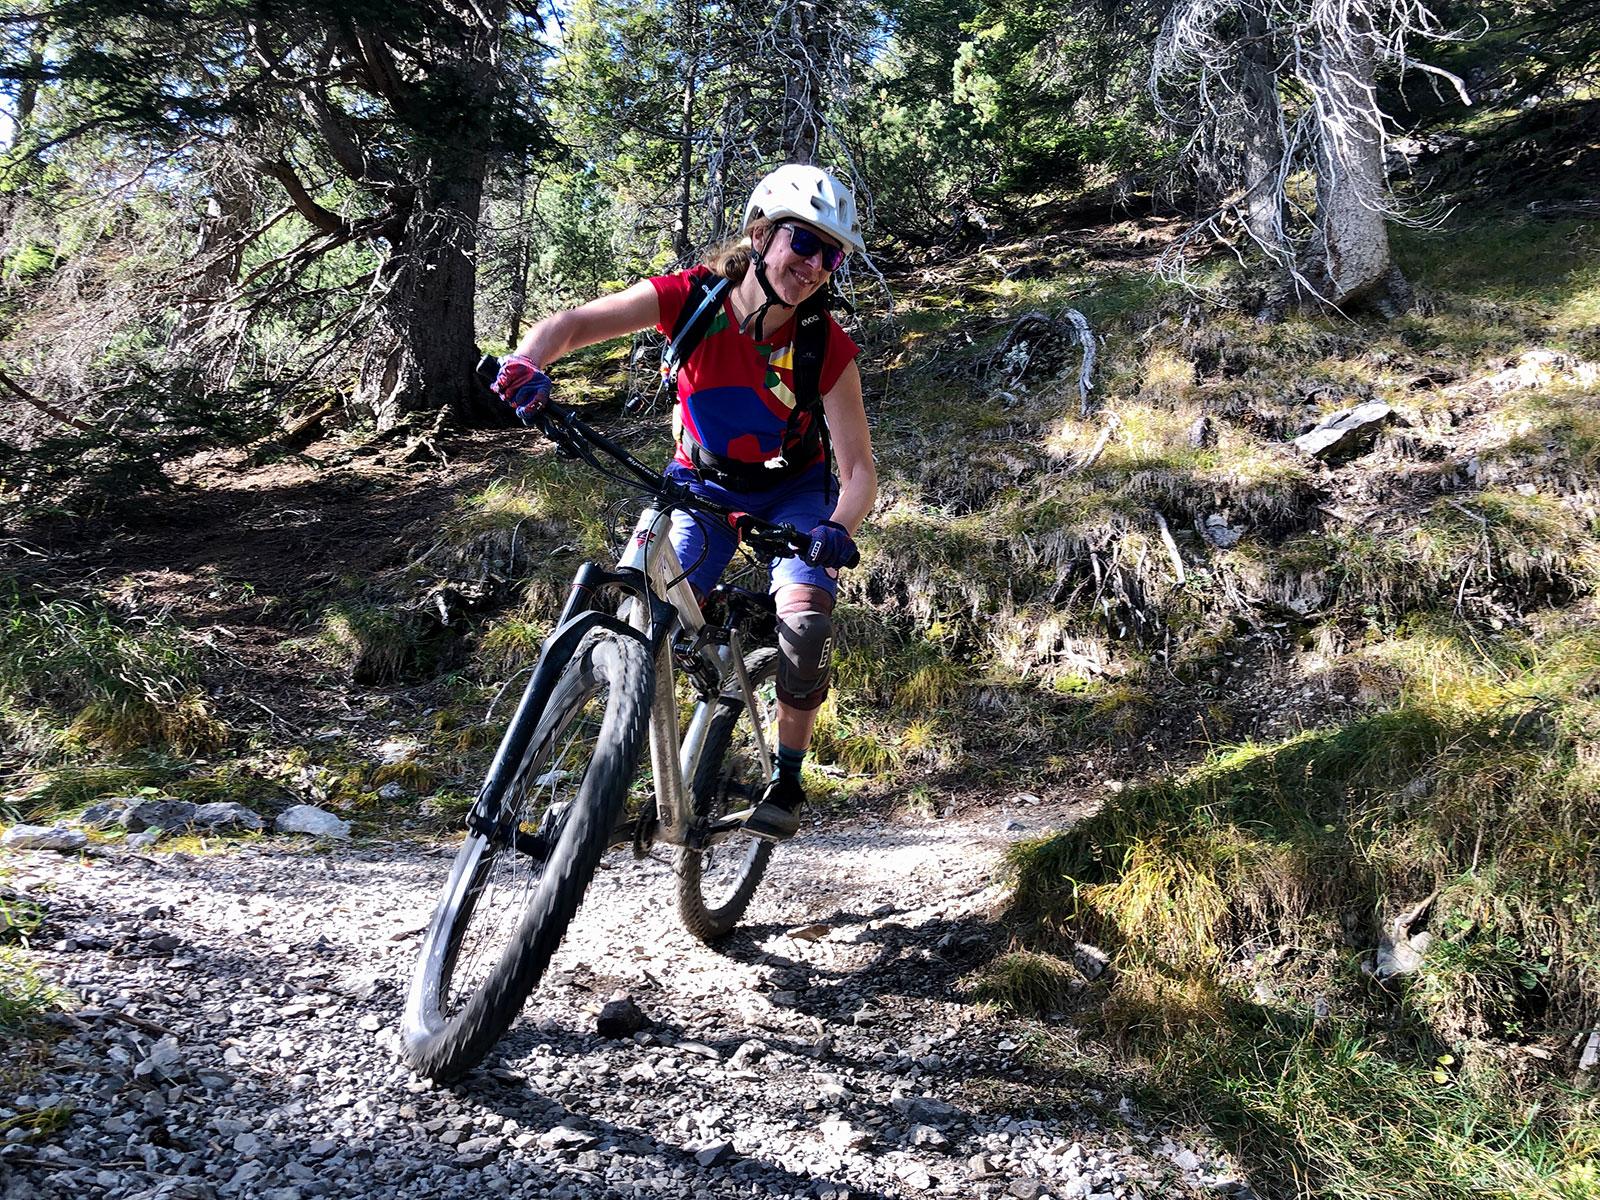 Joana_Schmidtjansen_Rumpeldipumpel_Mountainbiken_03